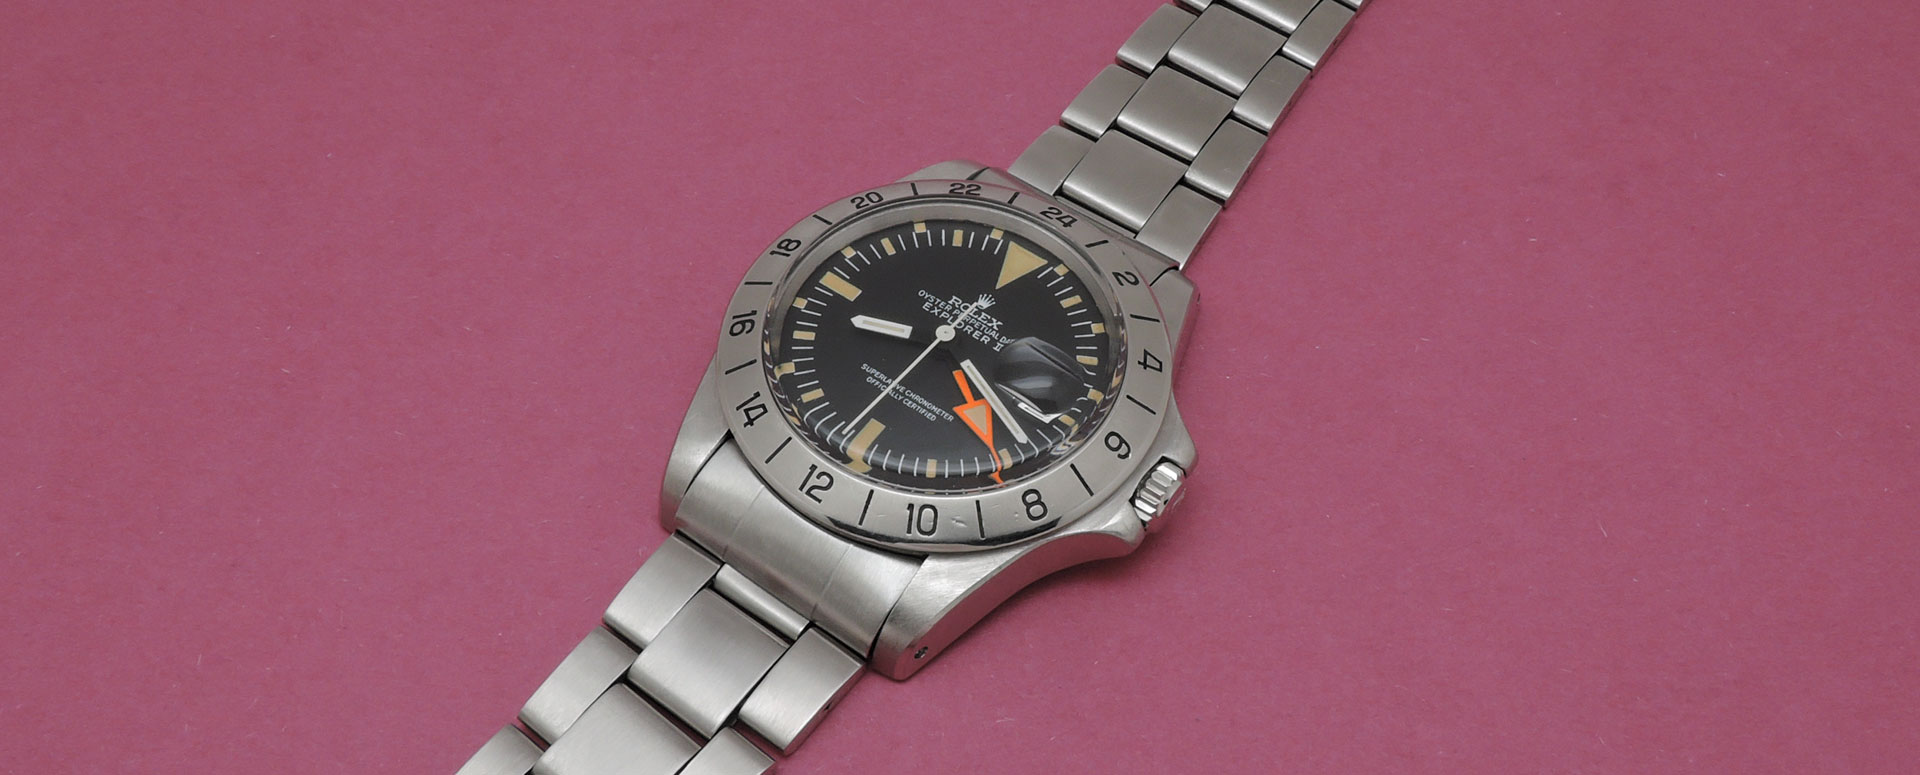 Ancienne  Compra Venta de Relojes · Bovet 5347  Rolex Daytona 6262   Explorer II 1655 ... e7b262a19609